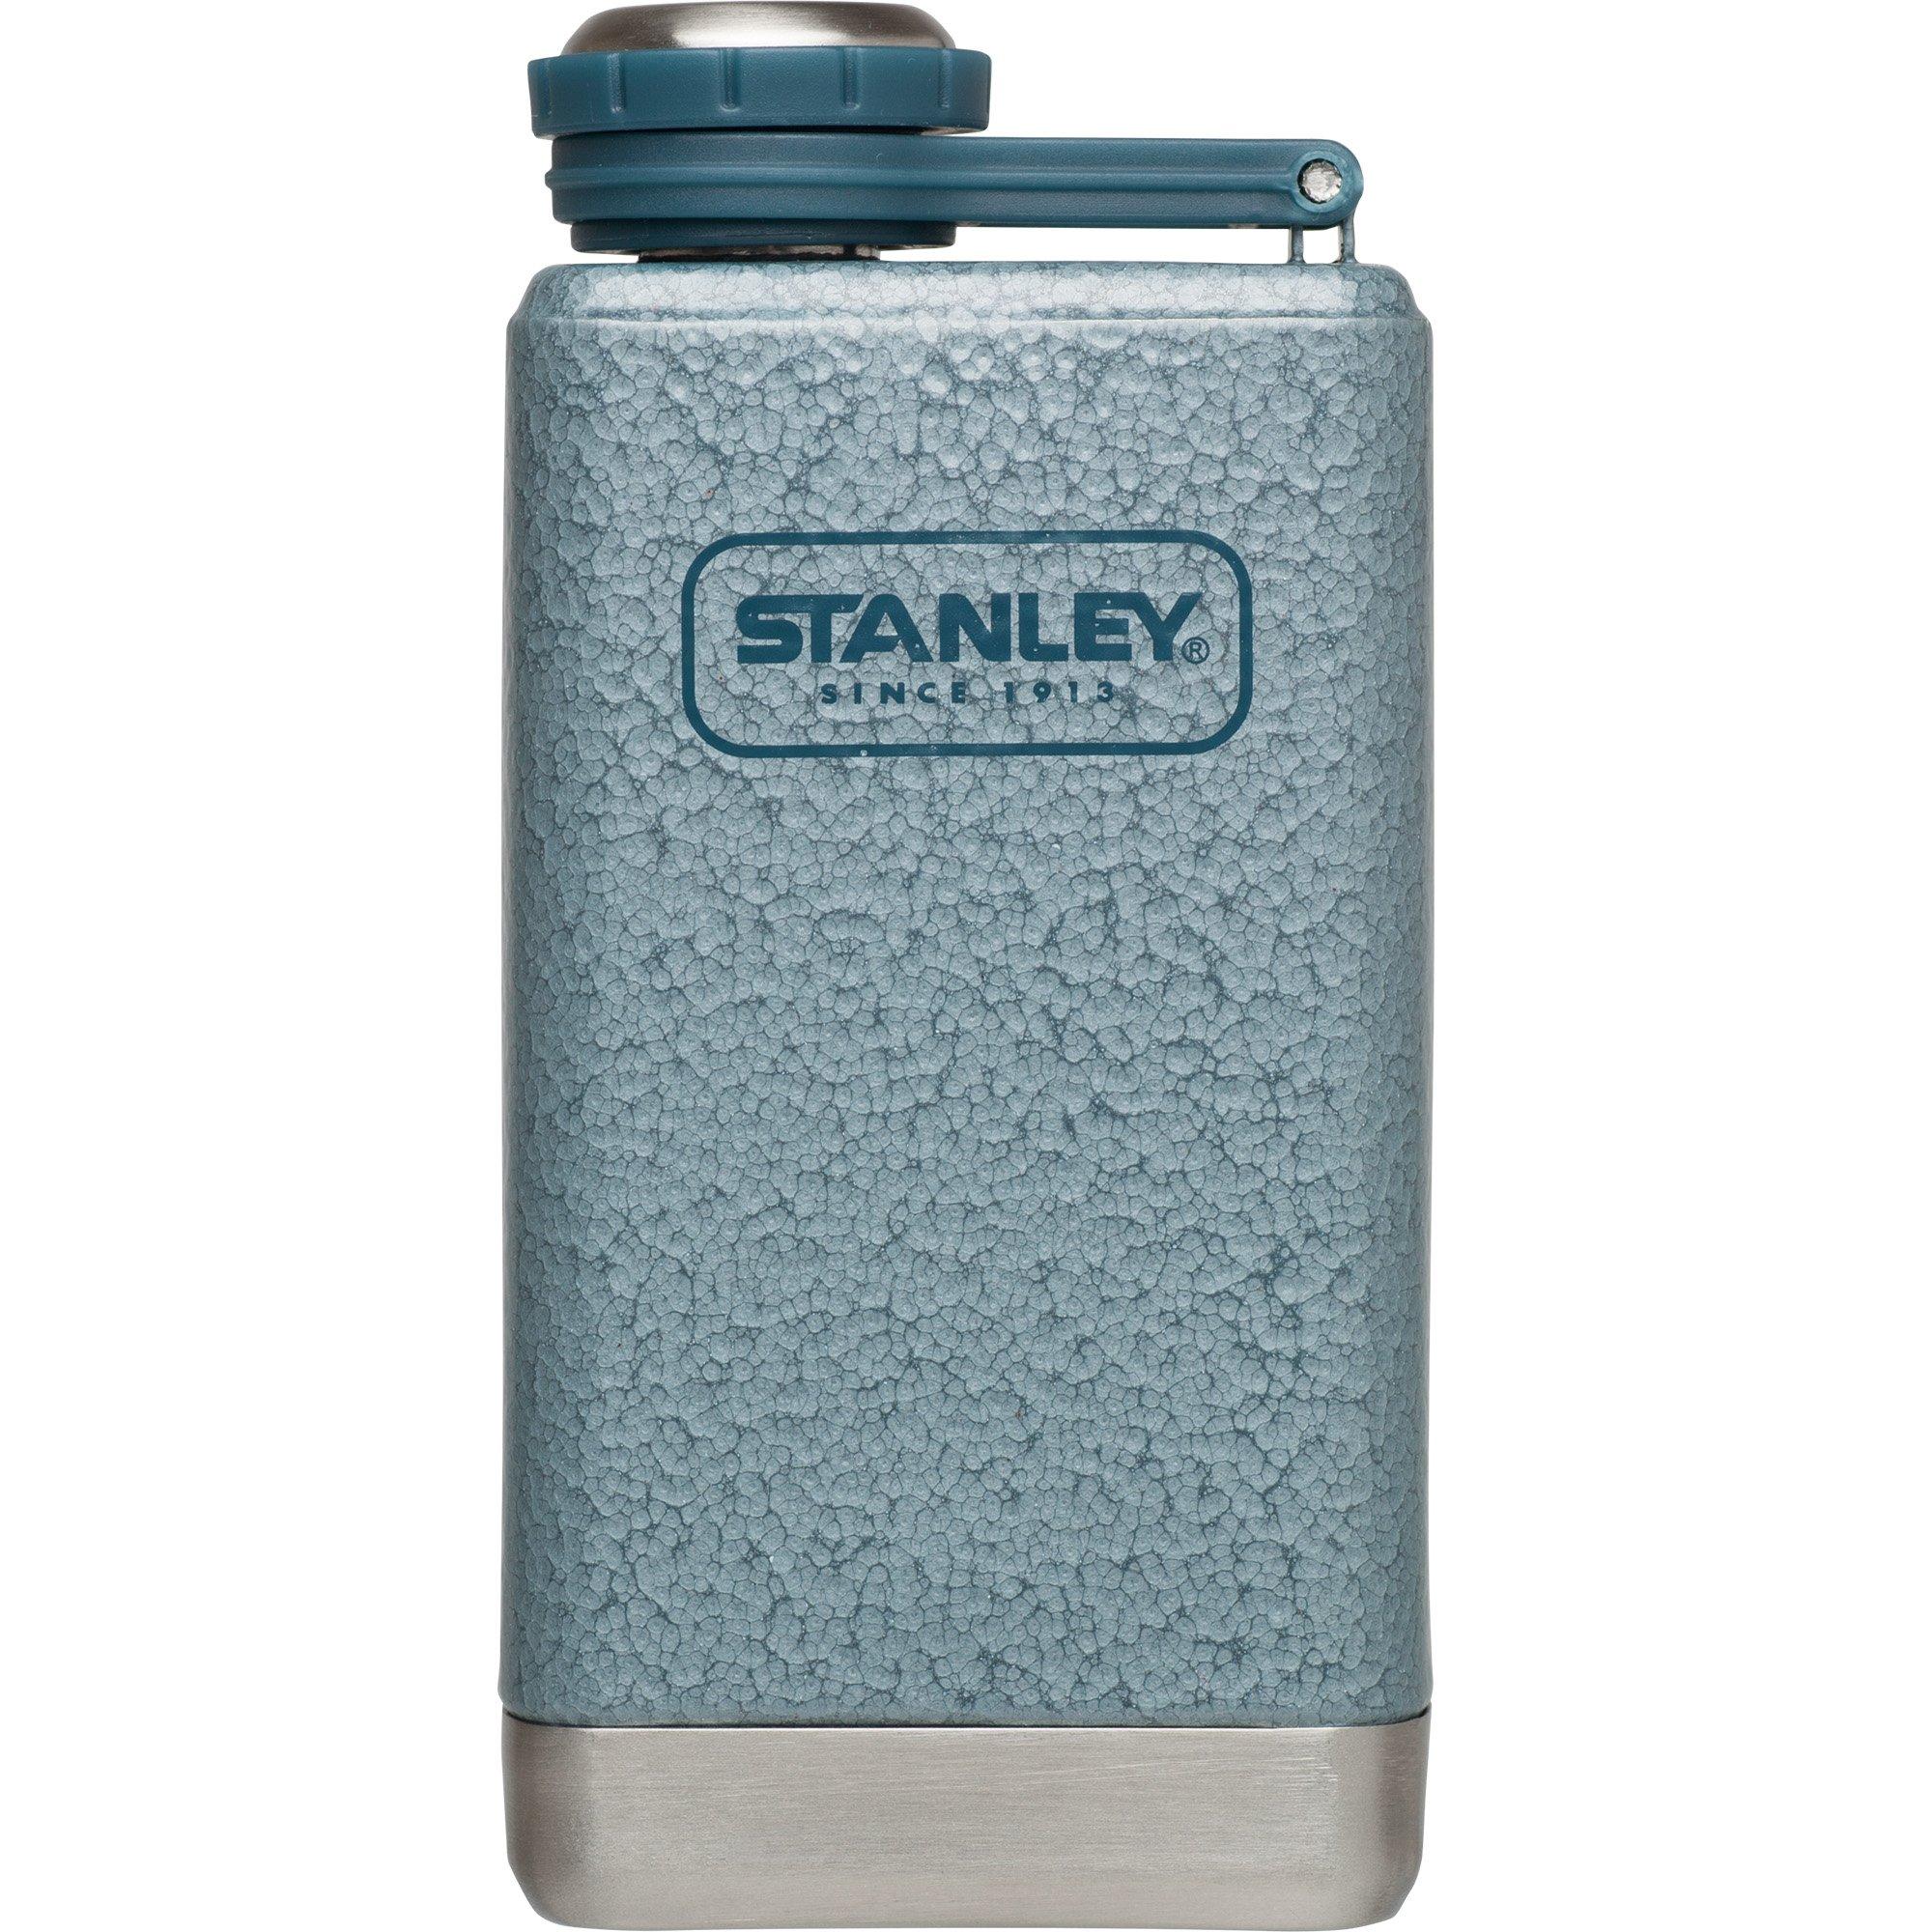 Stanley Adventure Stainless Steel Flask, Hammertone Ice, 5 oz